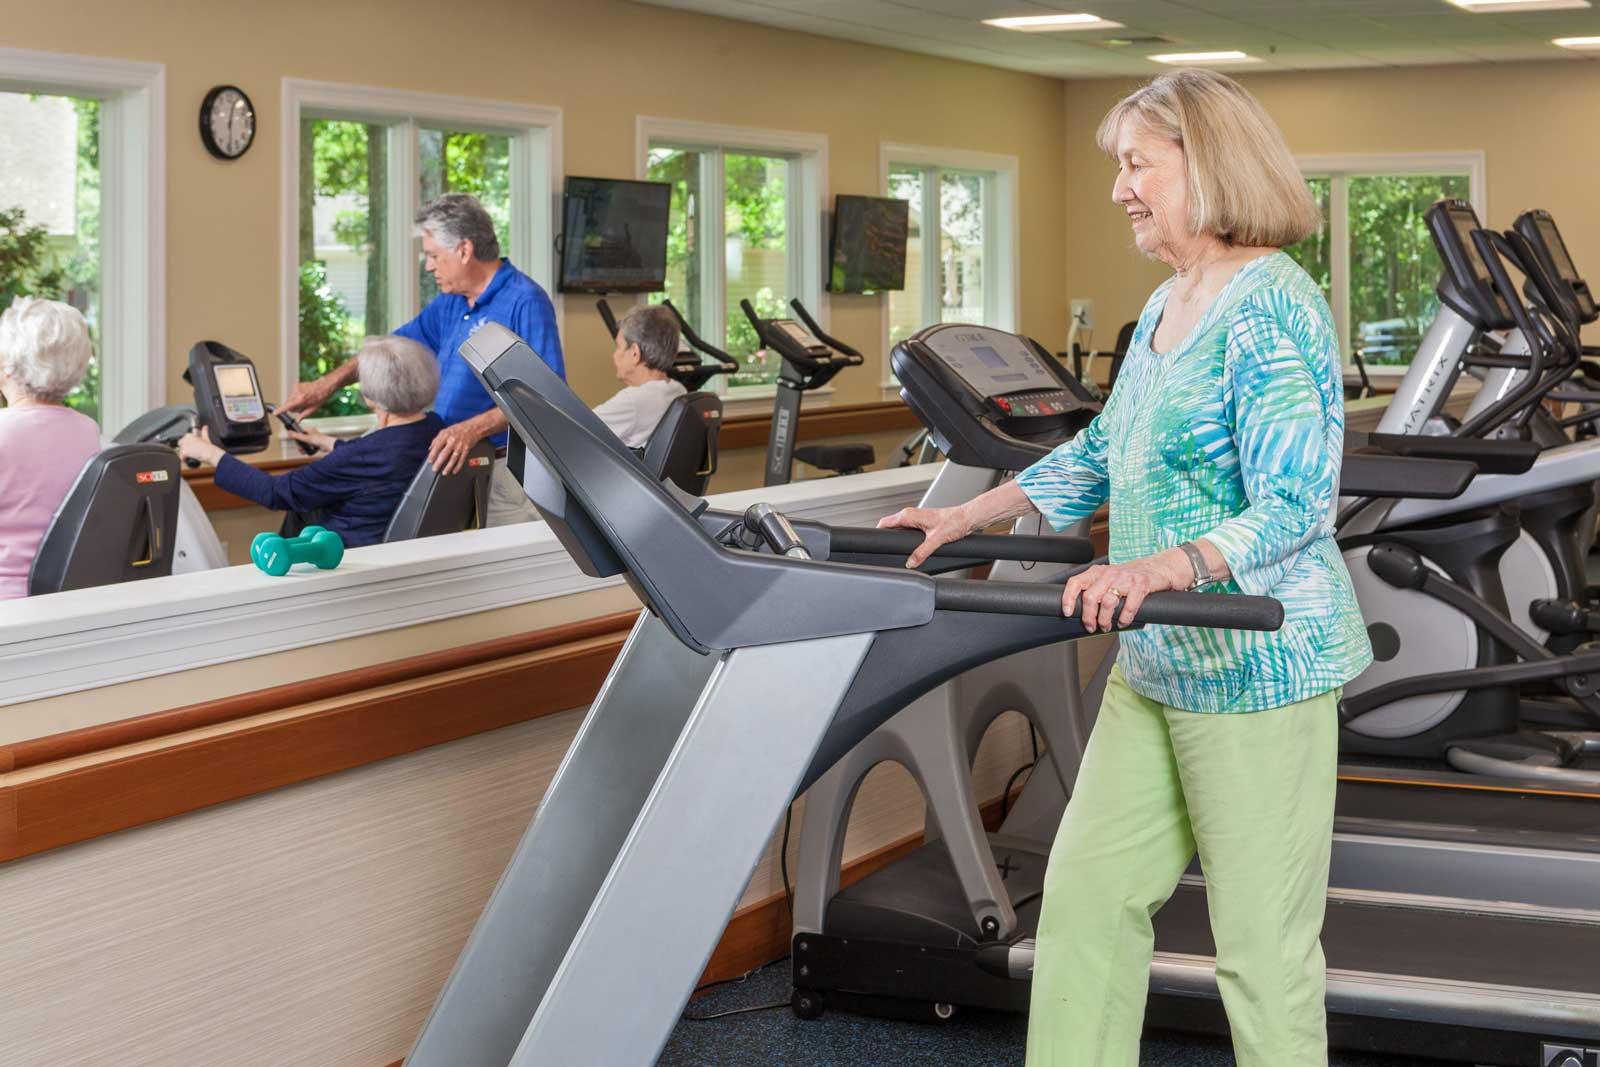 woman-uses-treadmill